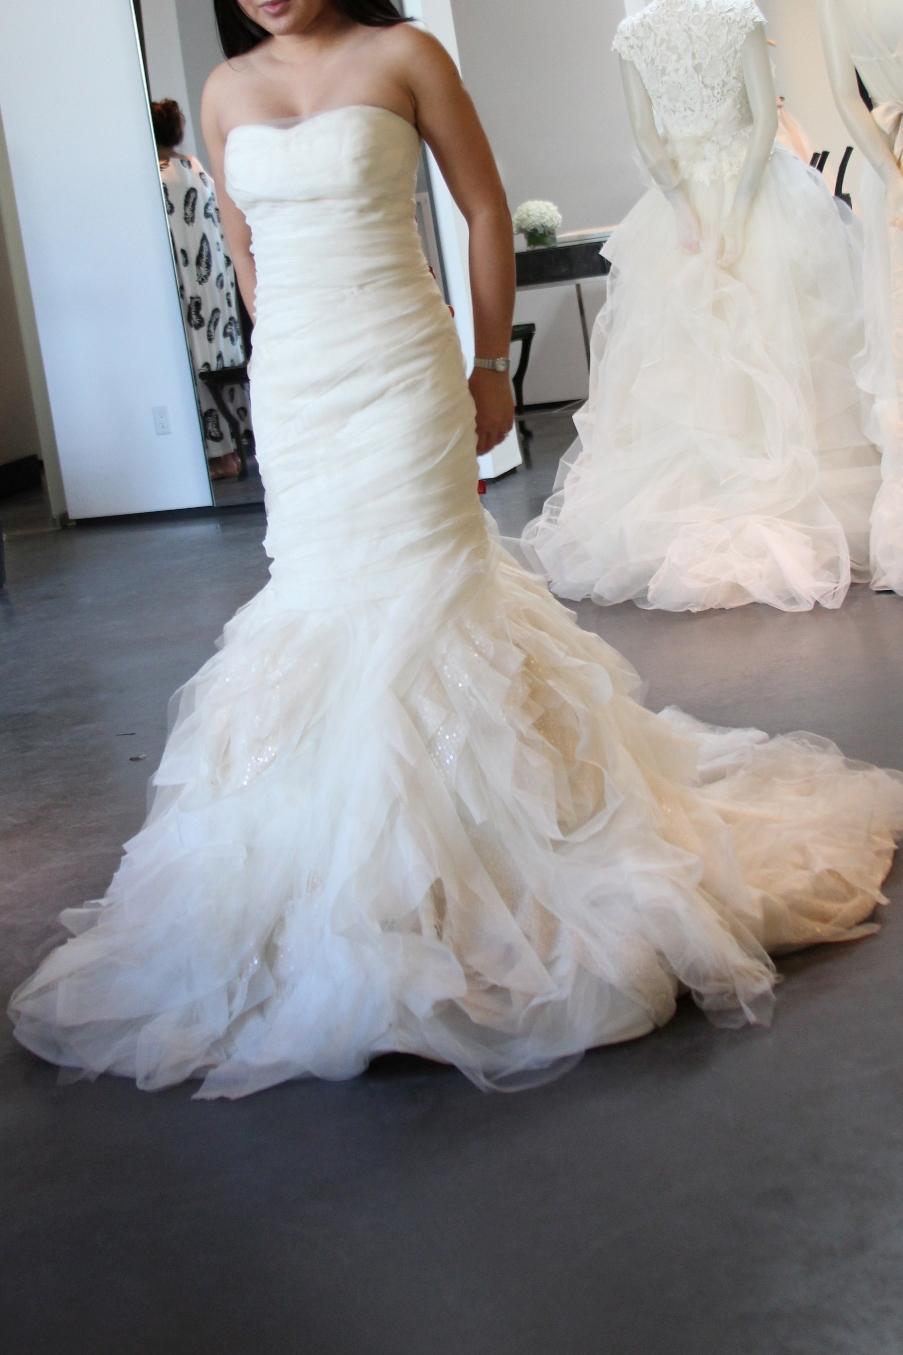 Petticoat Under Wedding Dress 39 Best